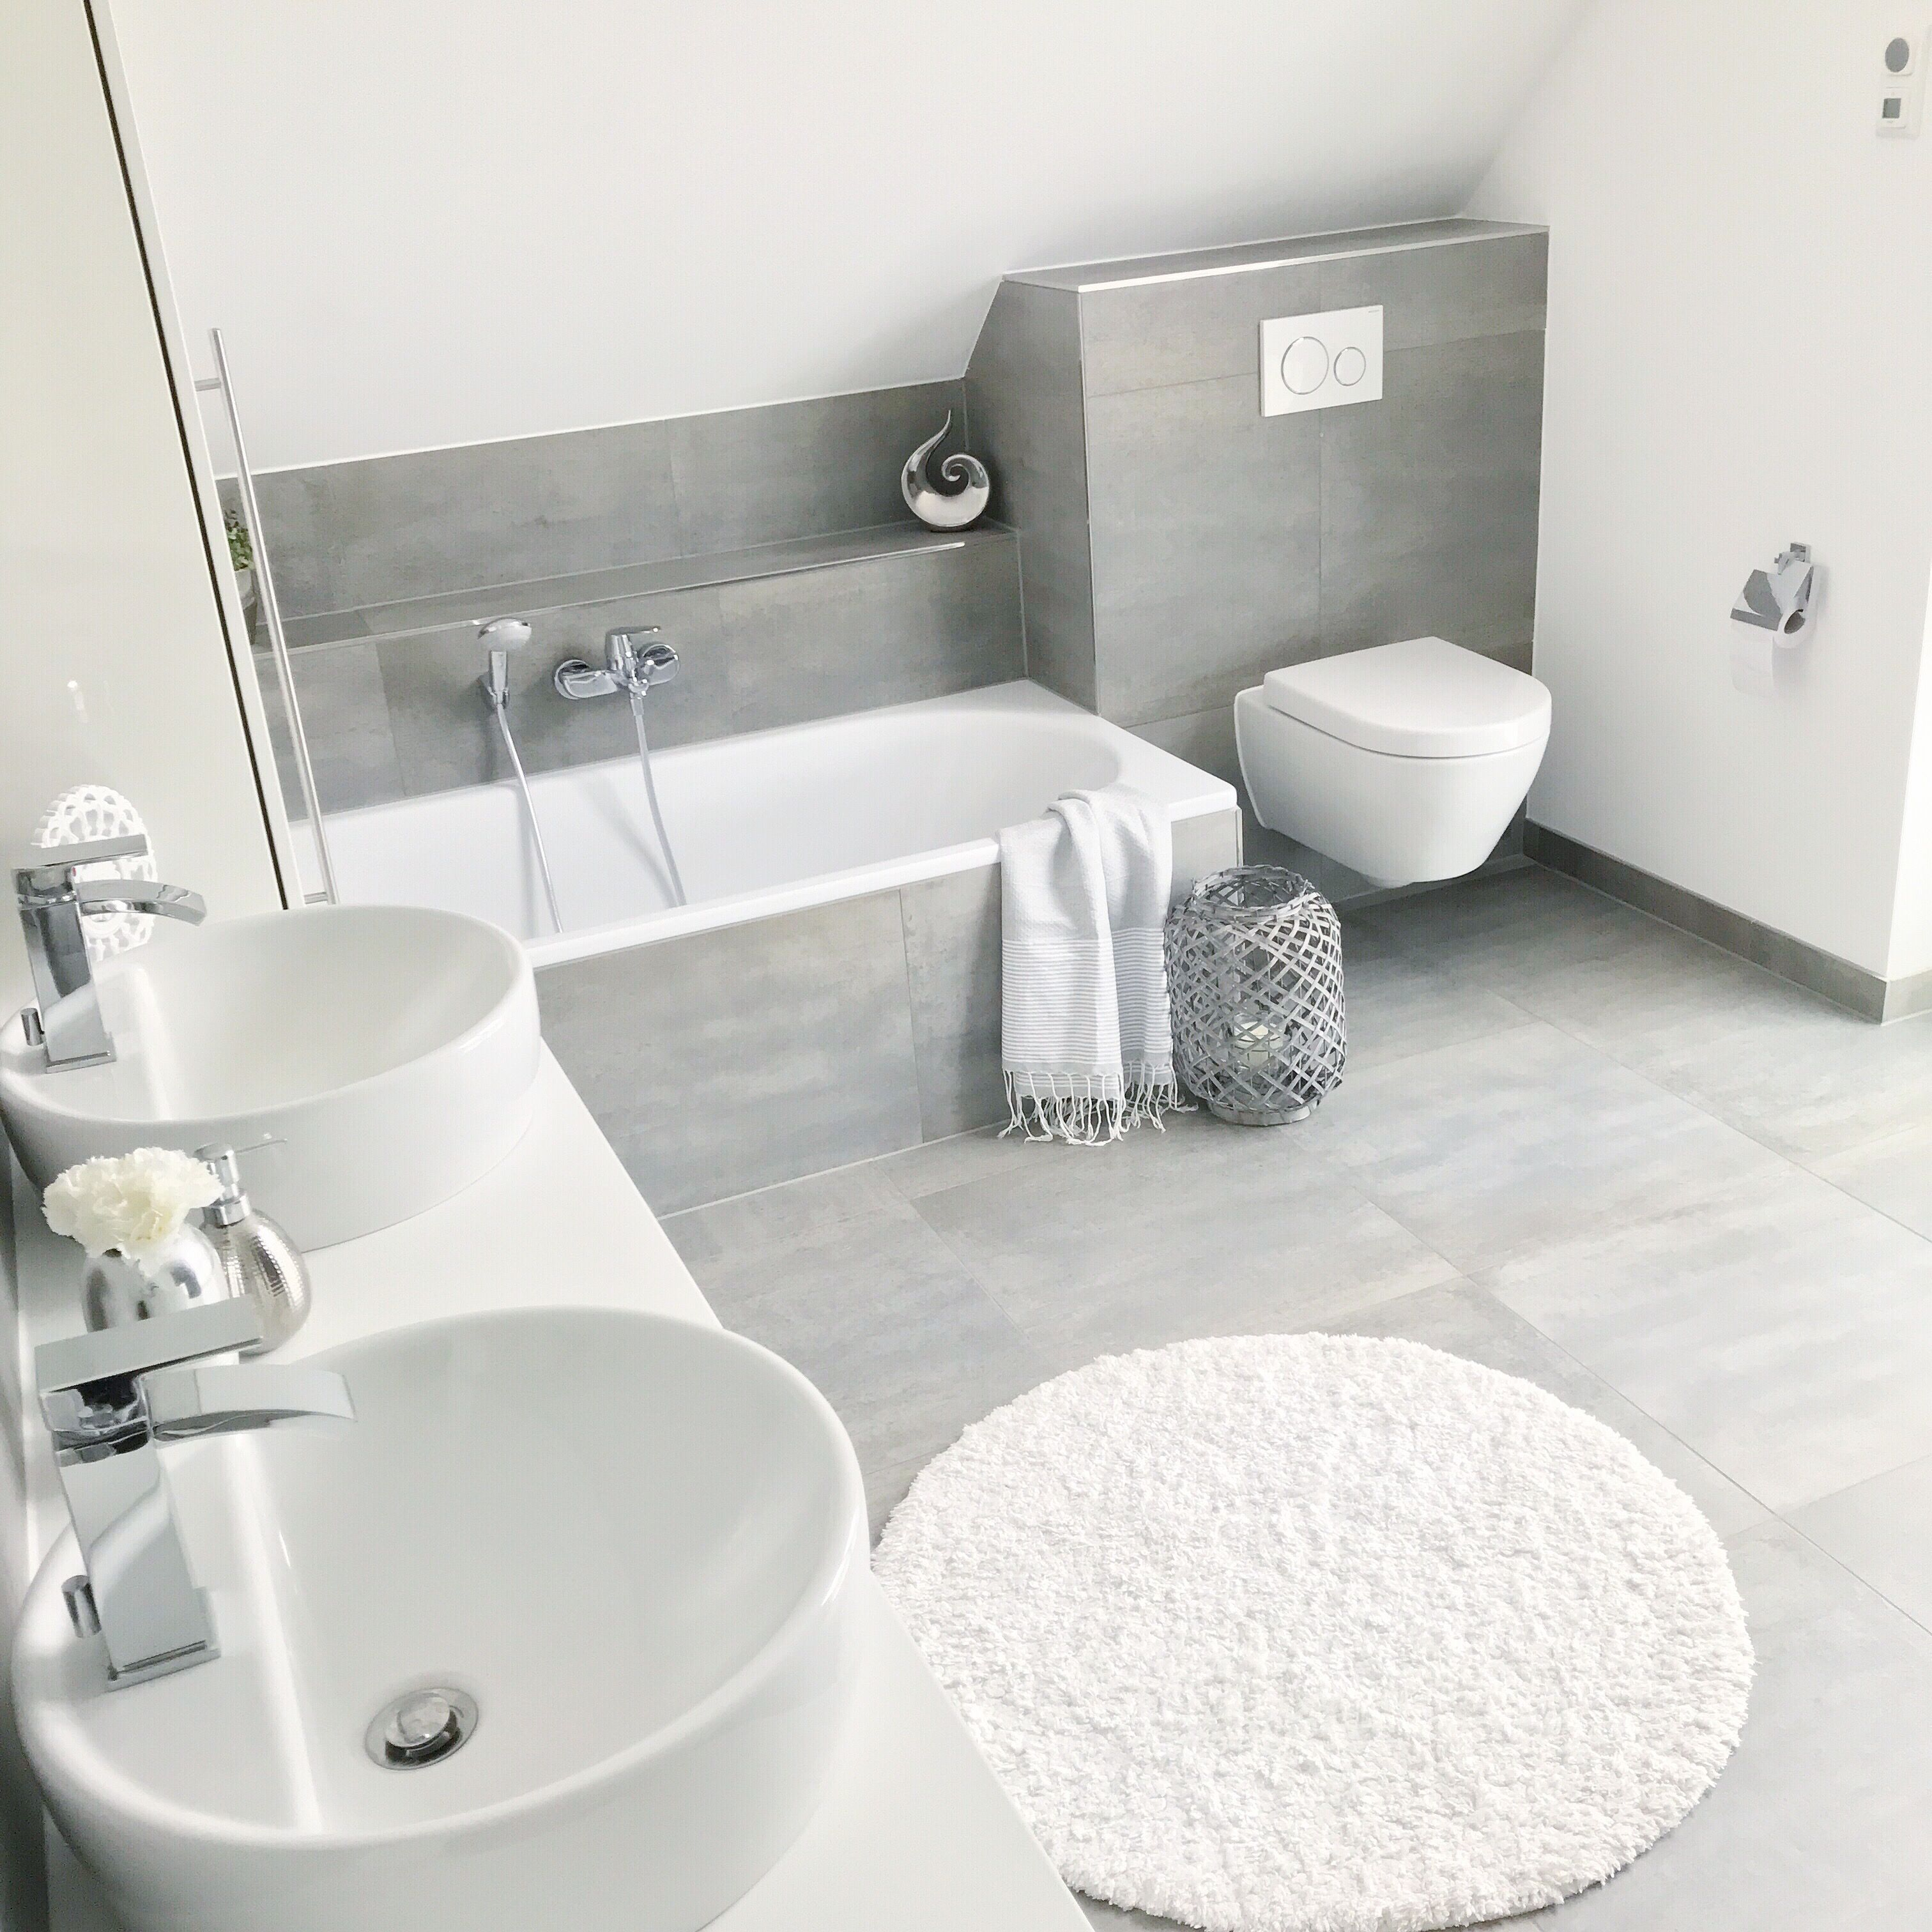 Instagram Wohn Emotion Landhaus Badezimmer Bathroom Modern Grau